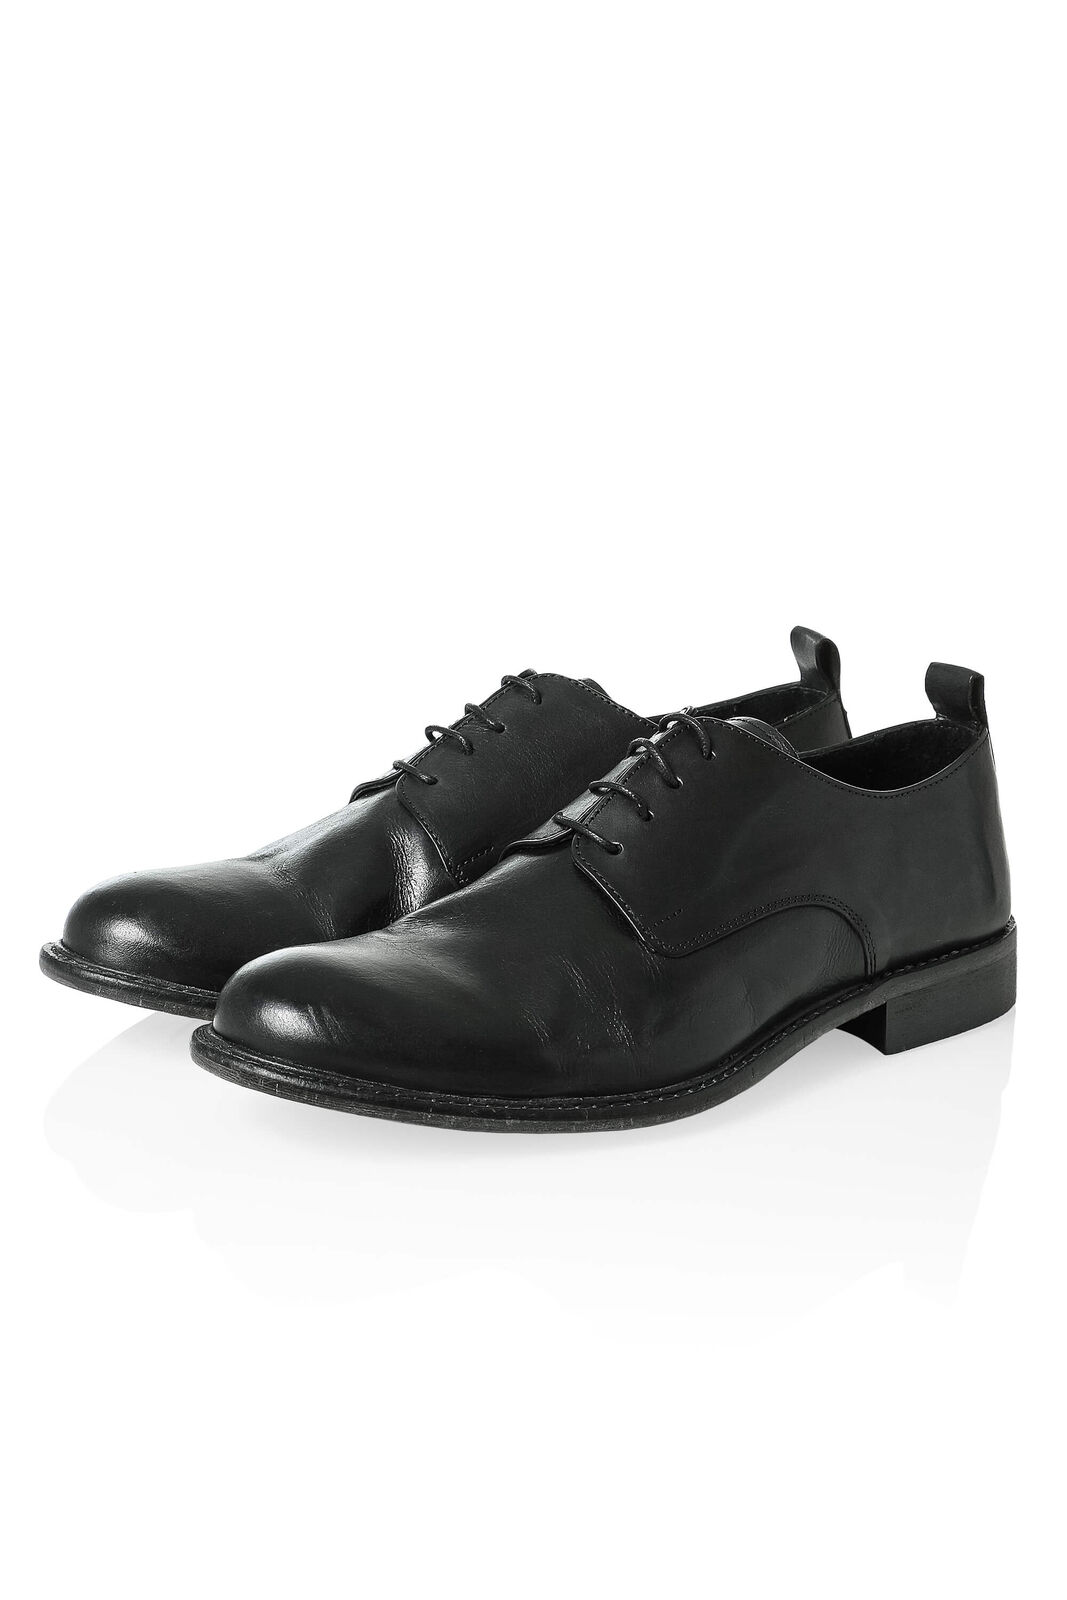 NEU Antony Schnürer Morato Herren Schnürschuhe Schnürer Antony Business Echtleder Schuhe 596cff